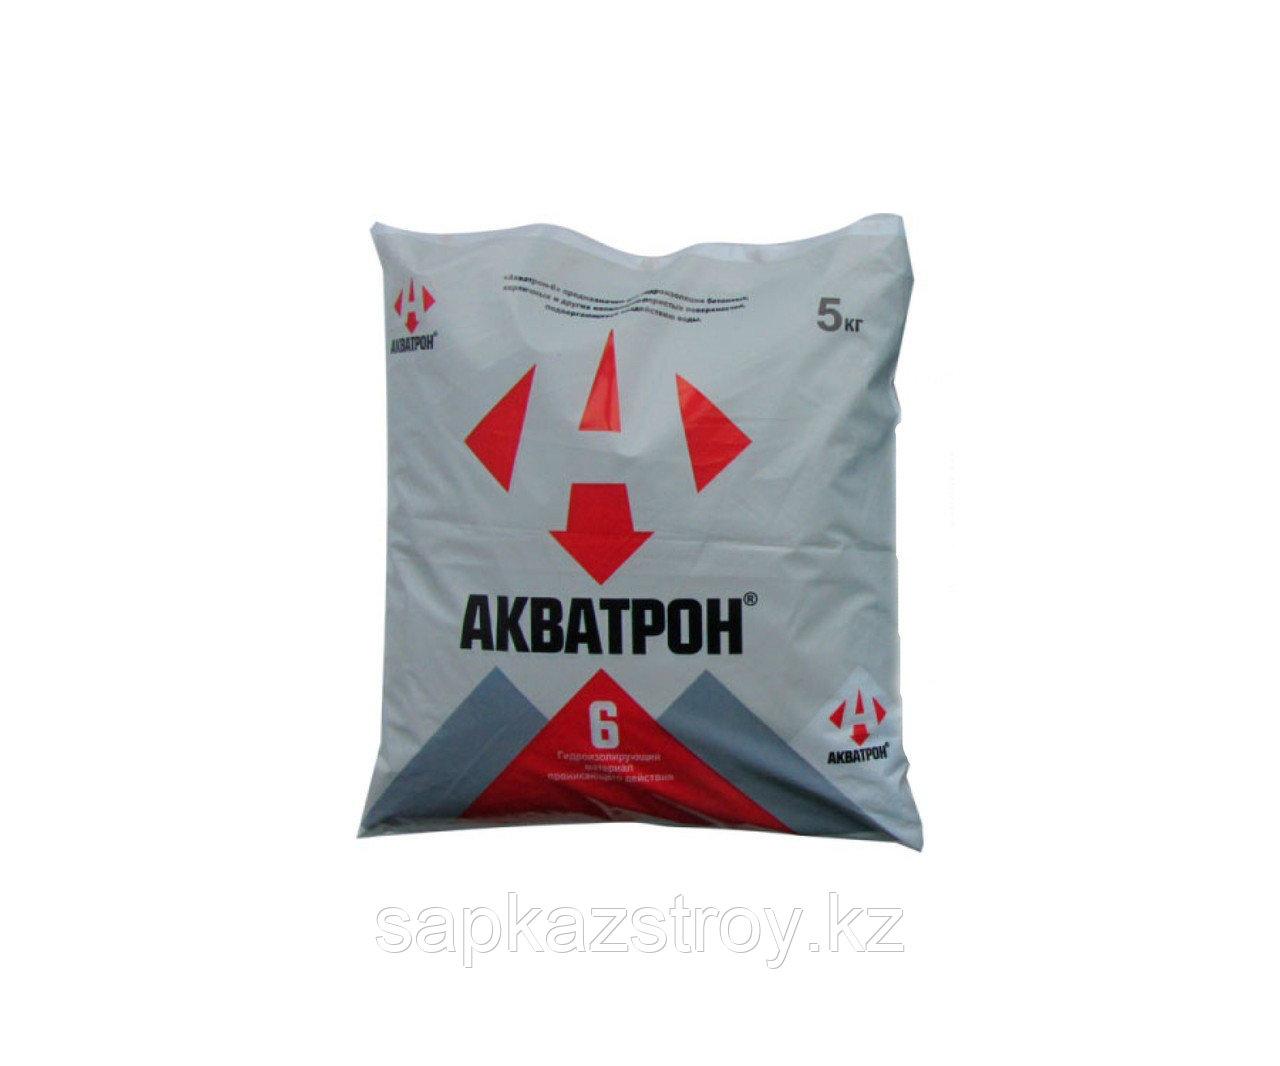 Герметик АКВАТРОН 6